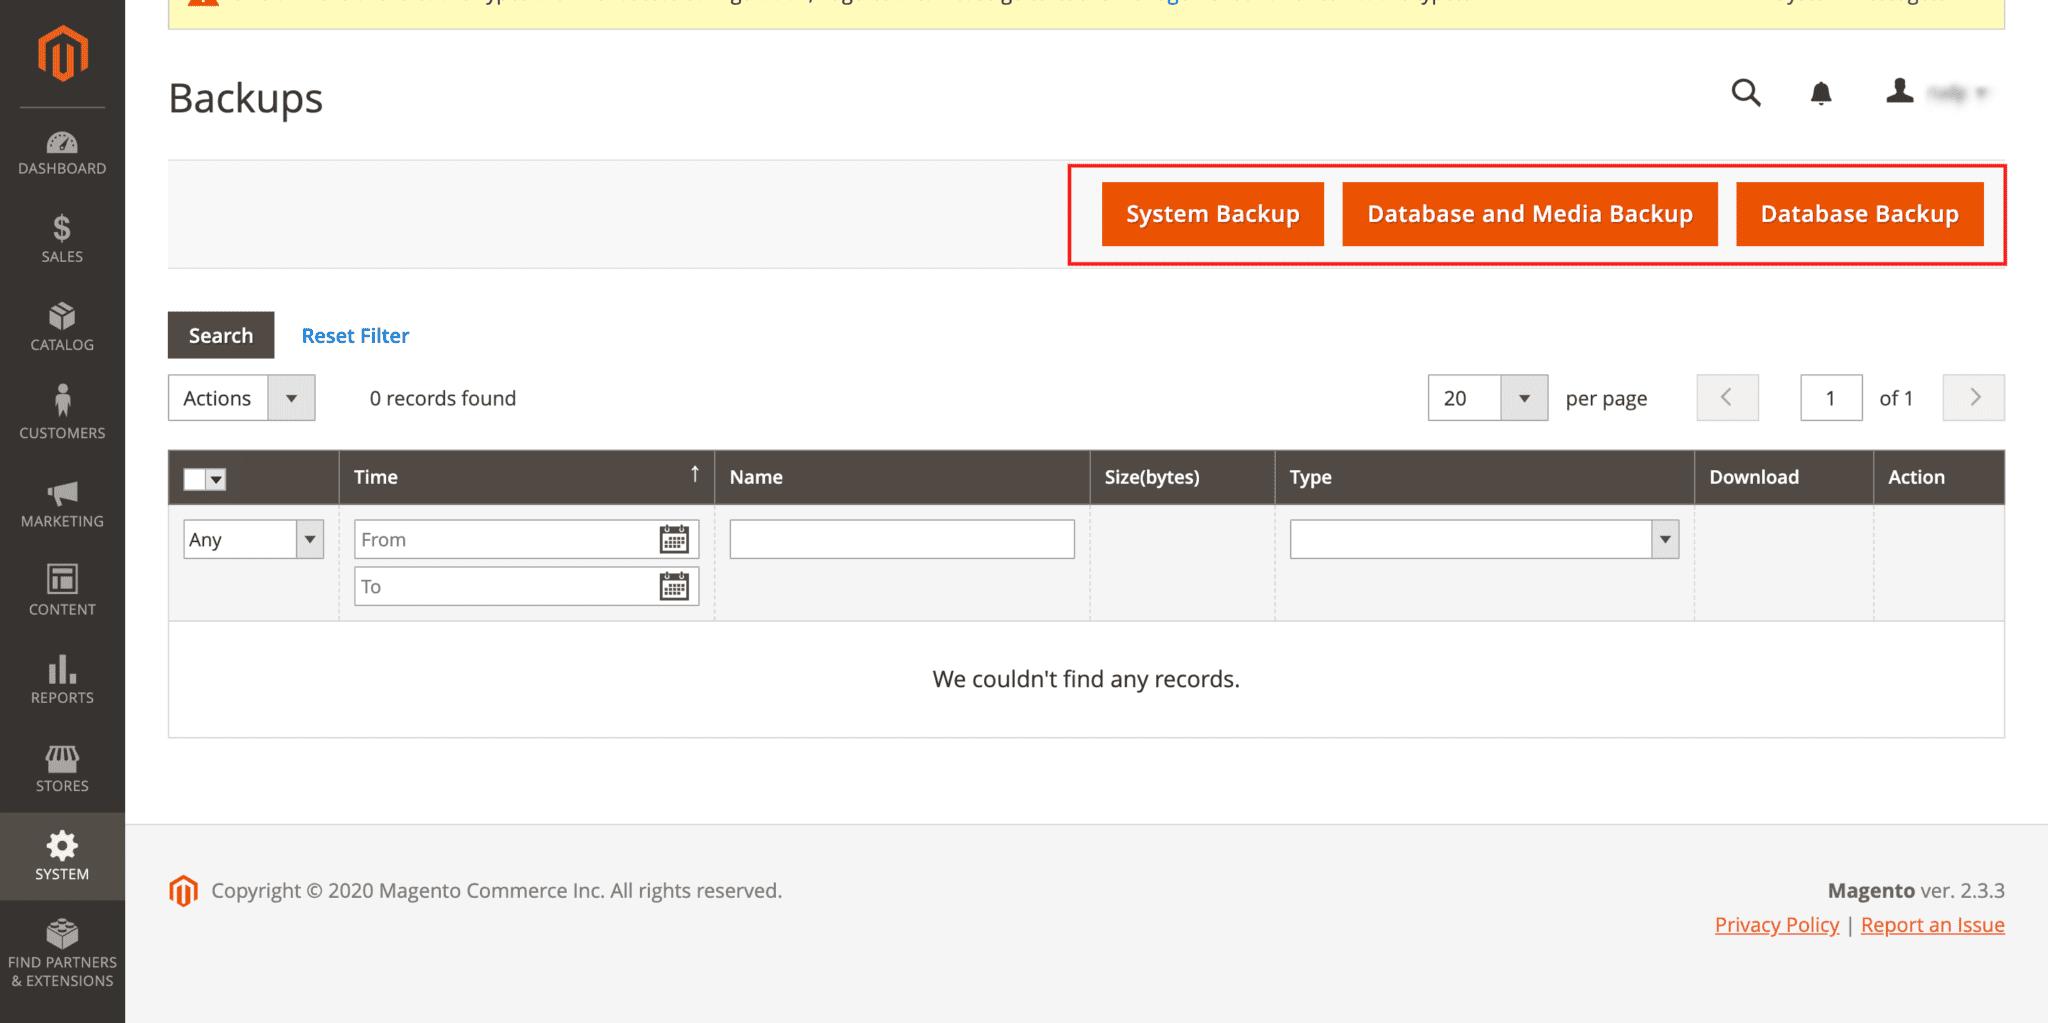 Select System Backup